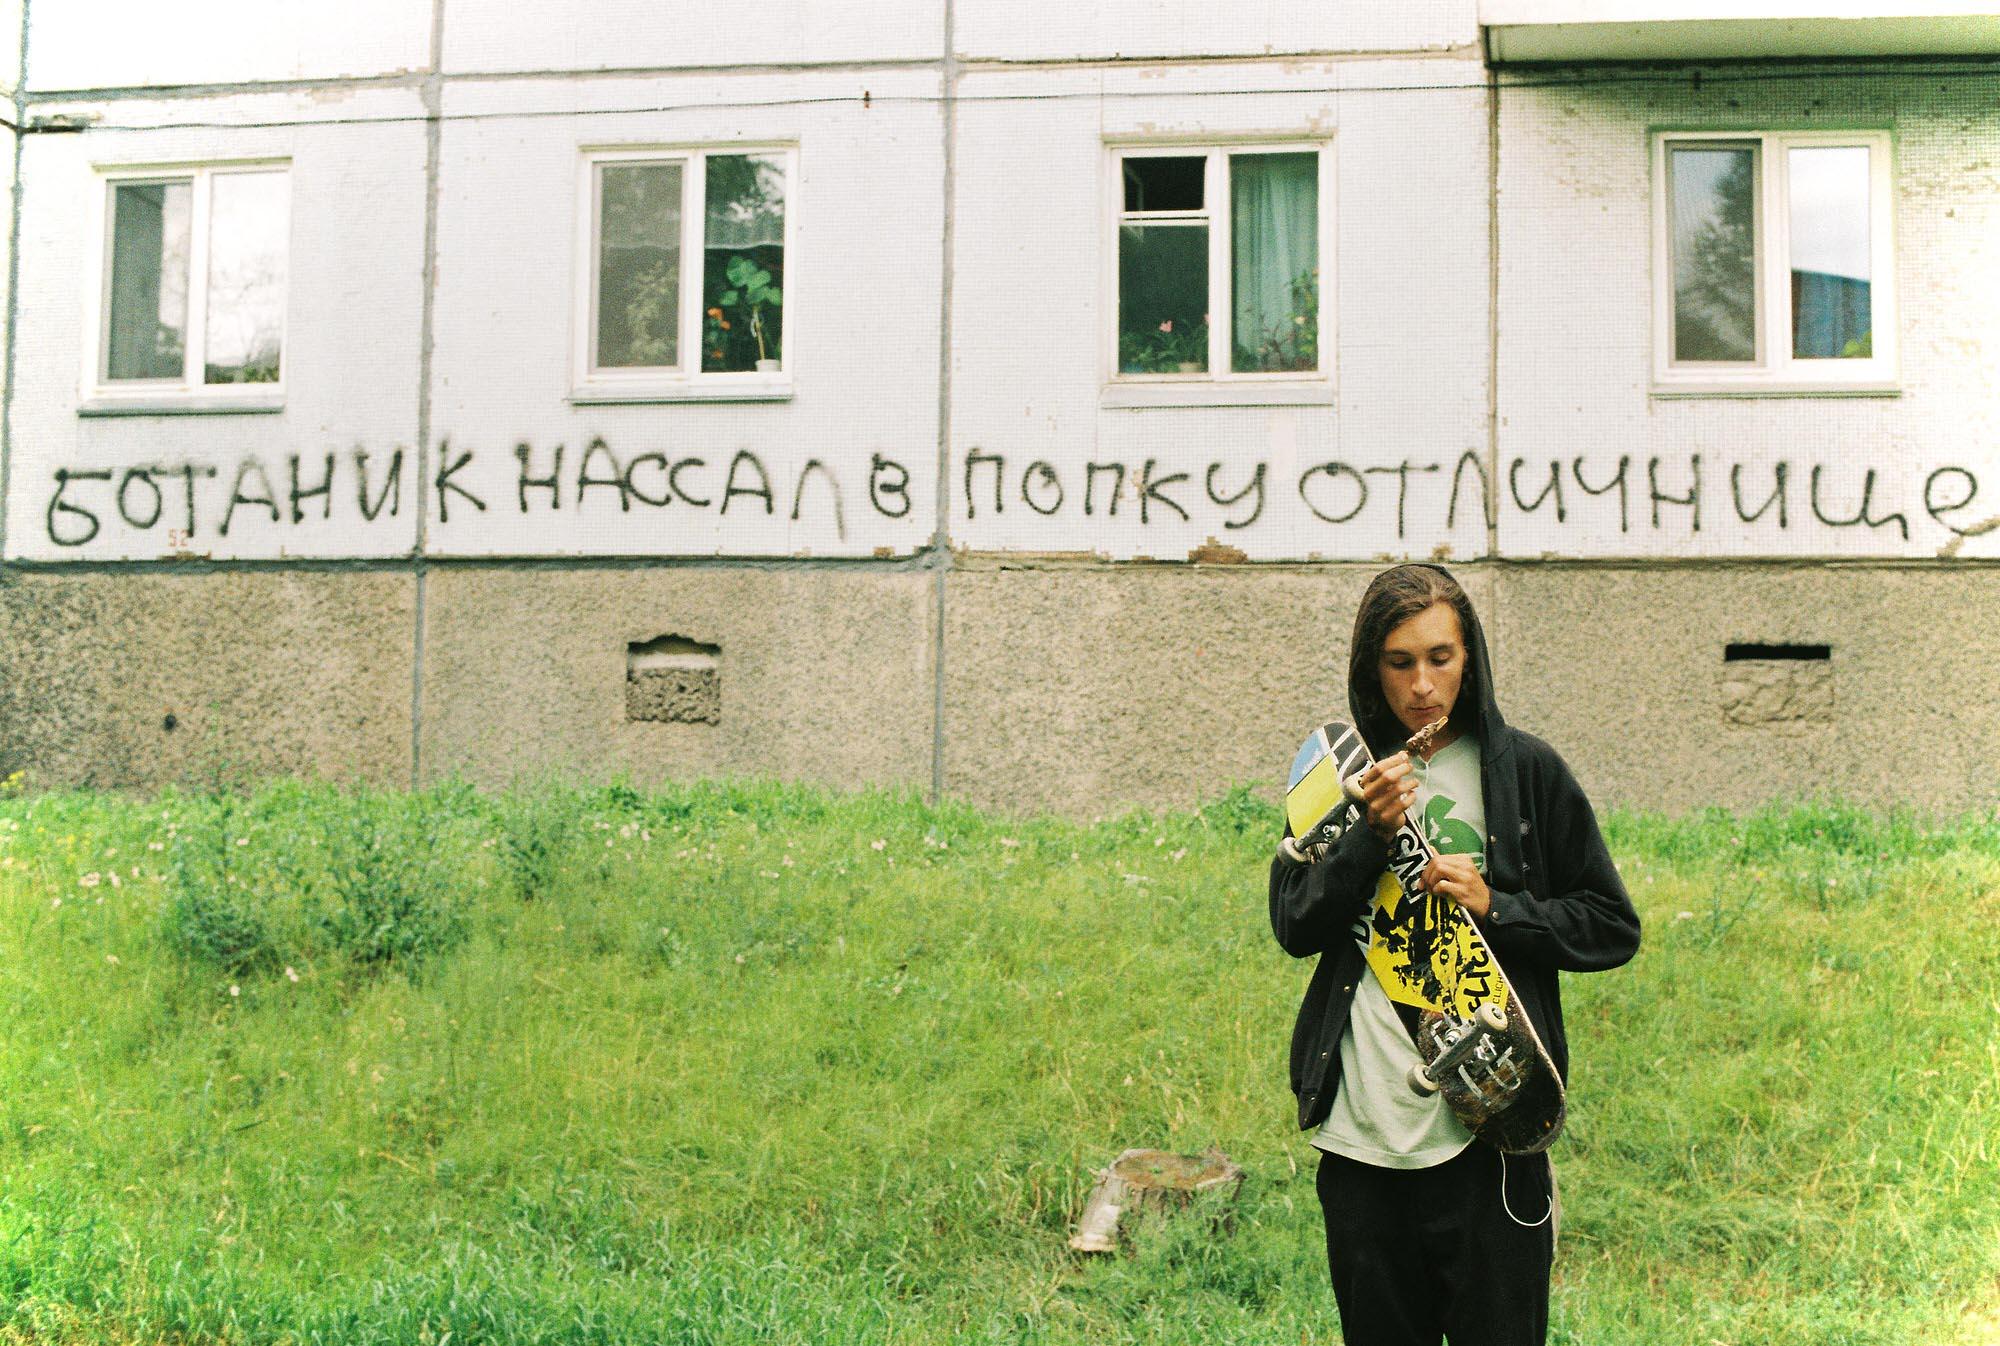 35mmPatrikWallner_Krasnoyarsk_NerdLOWQ